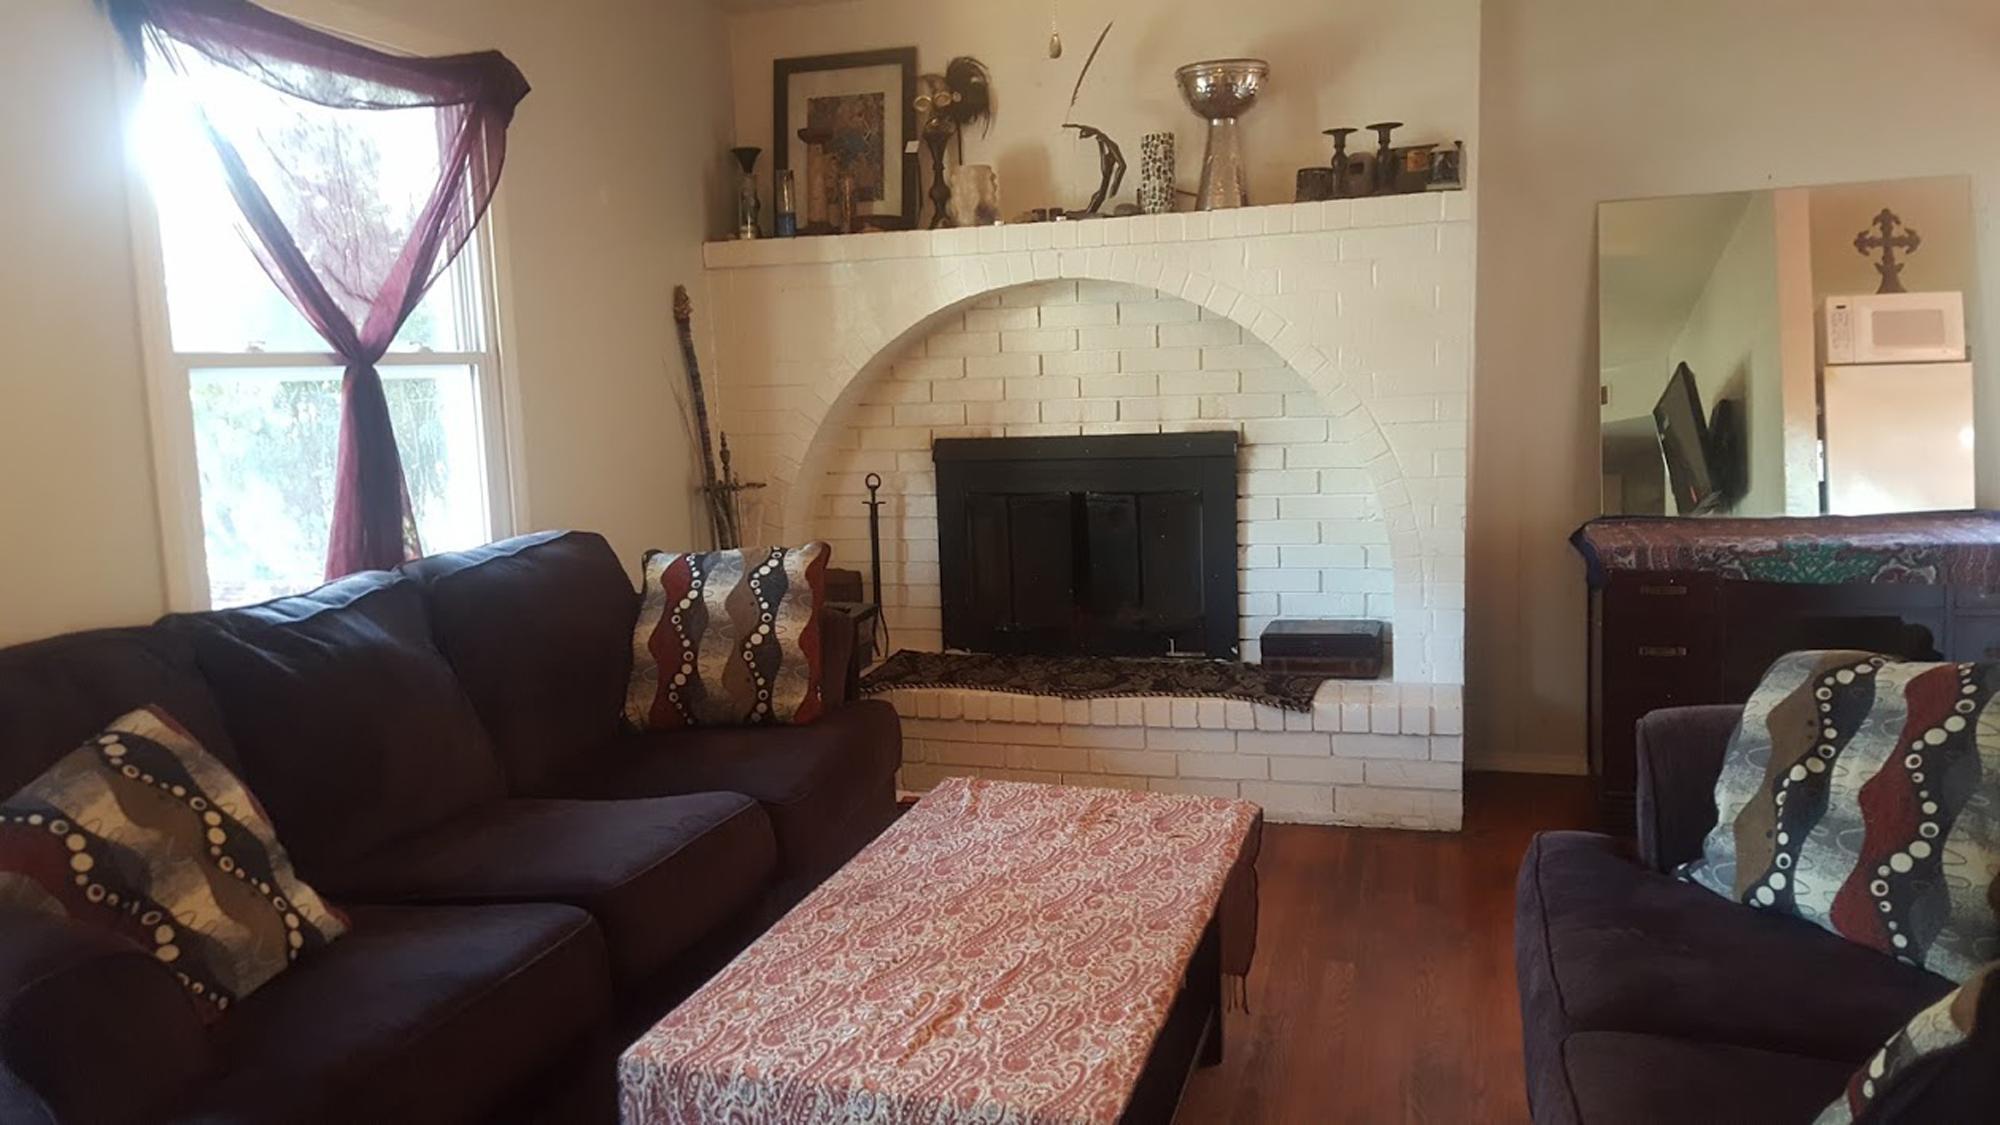 2122 Bristow St For Rent - Kansas City, KS   Trulia